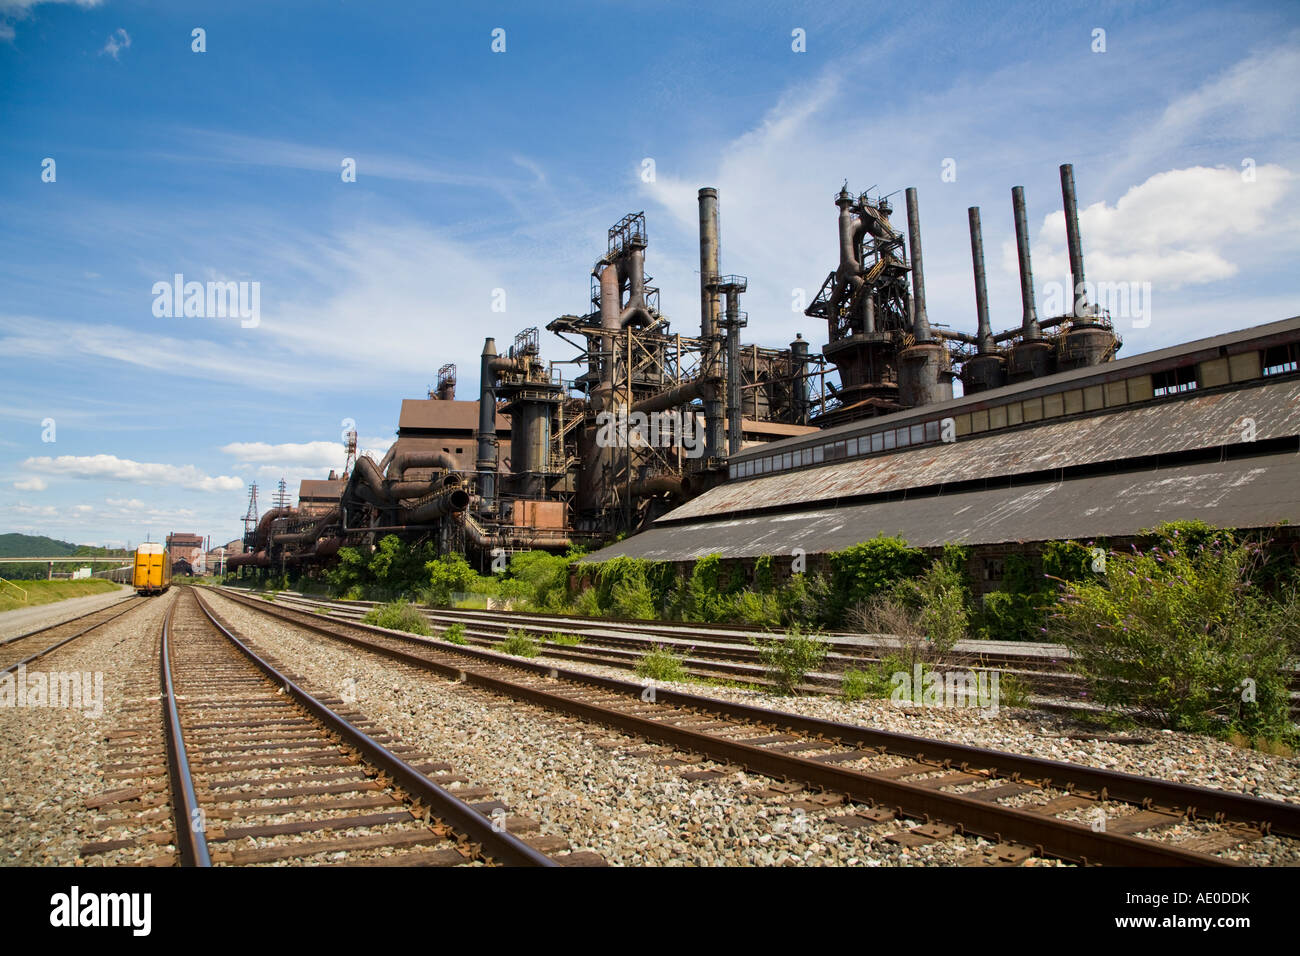 Closed Bethlehem Steel Mill July 2007 Stock Photo: 13526958 - Alamy